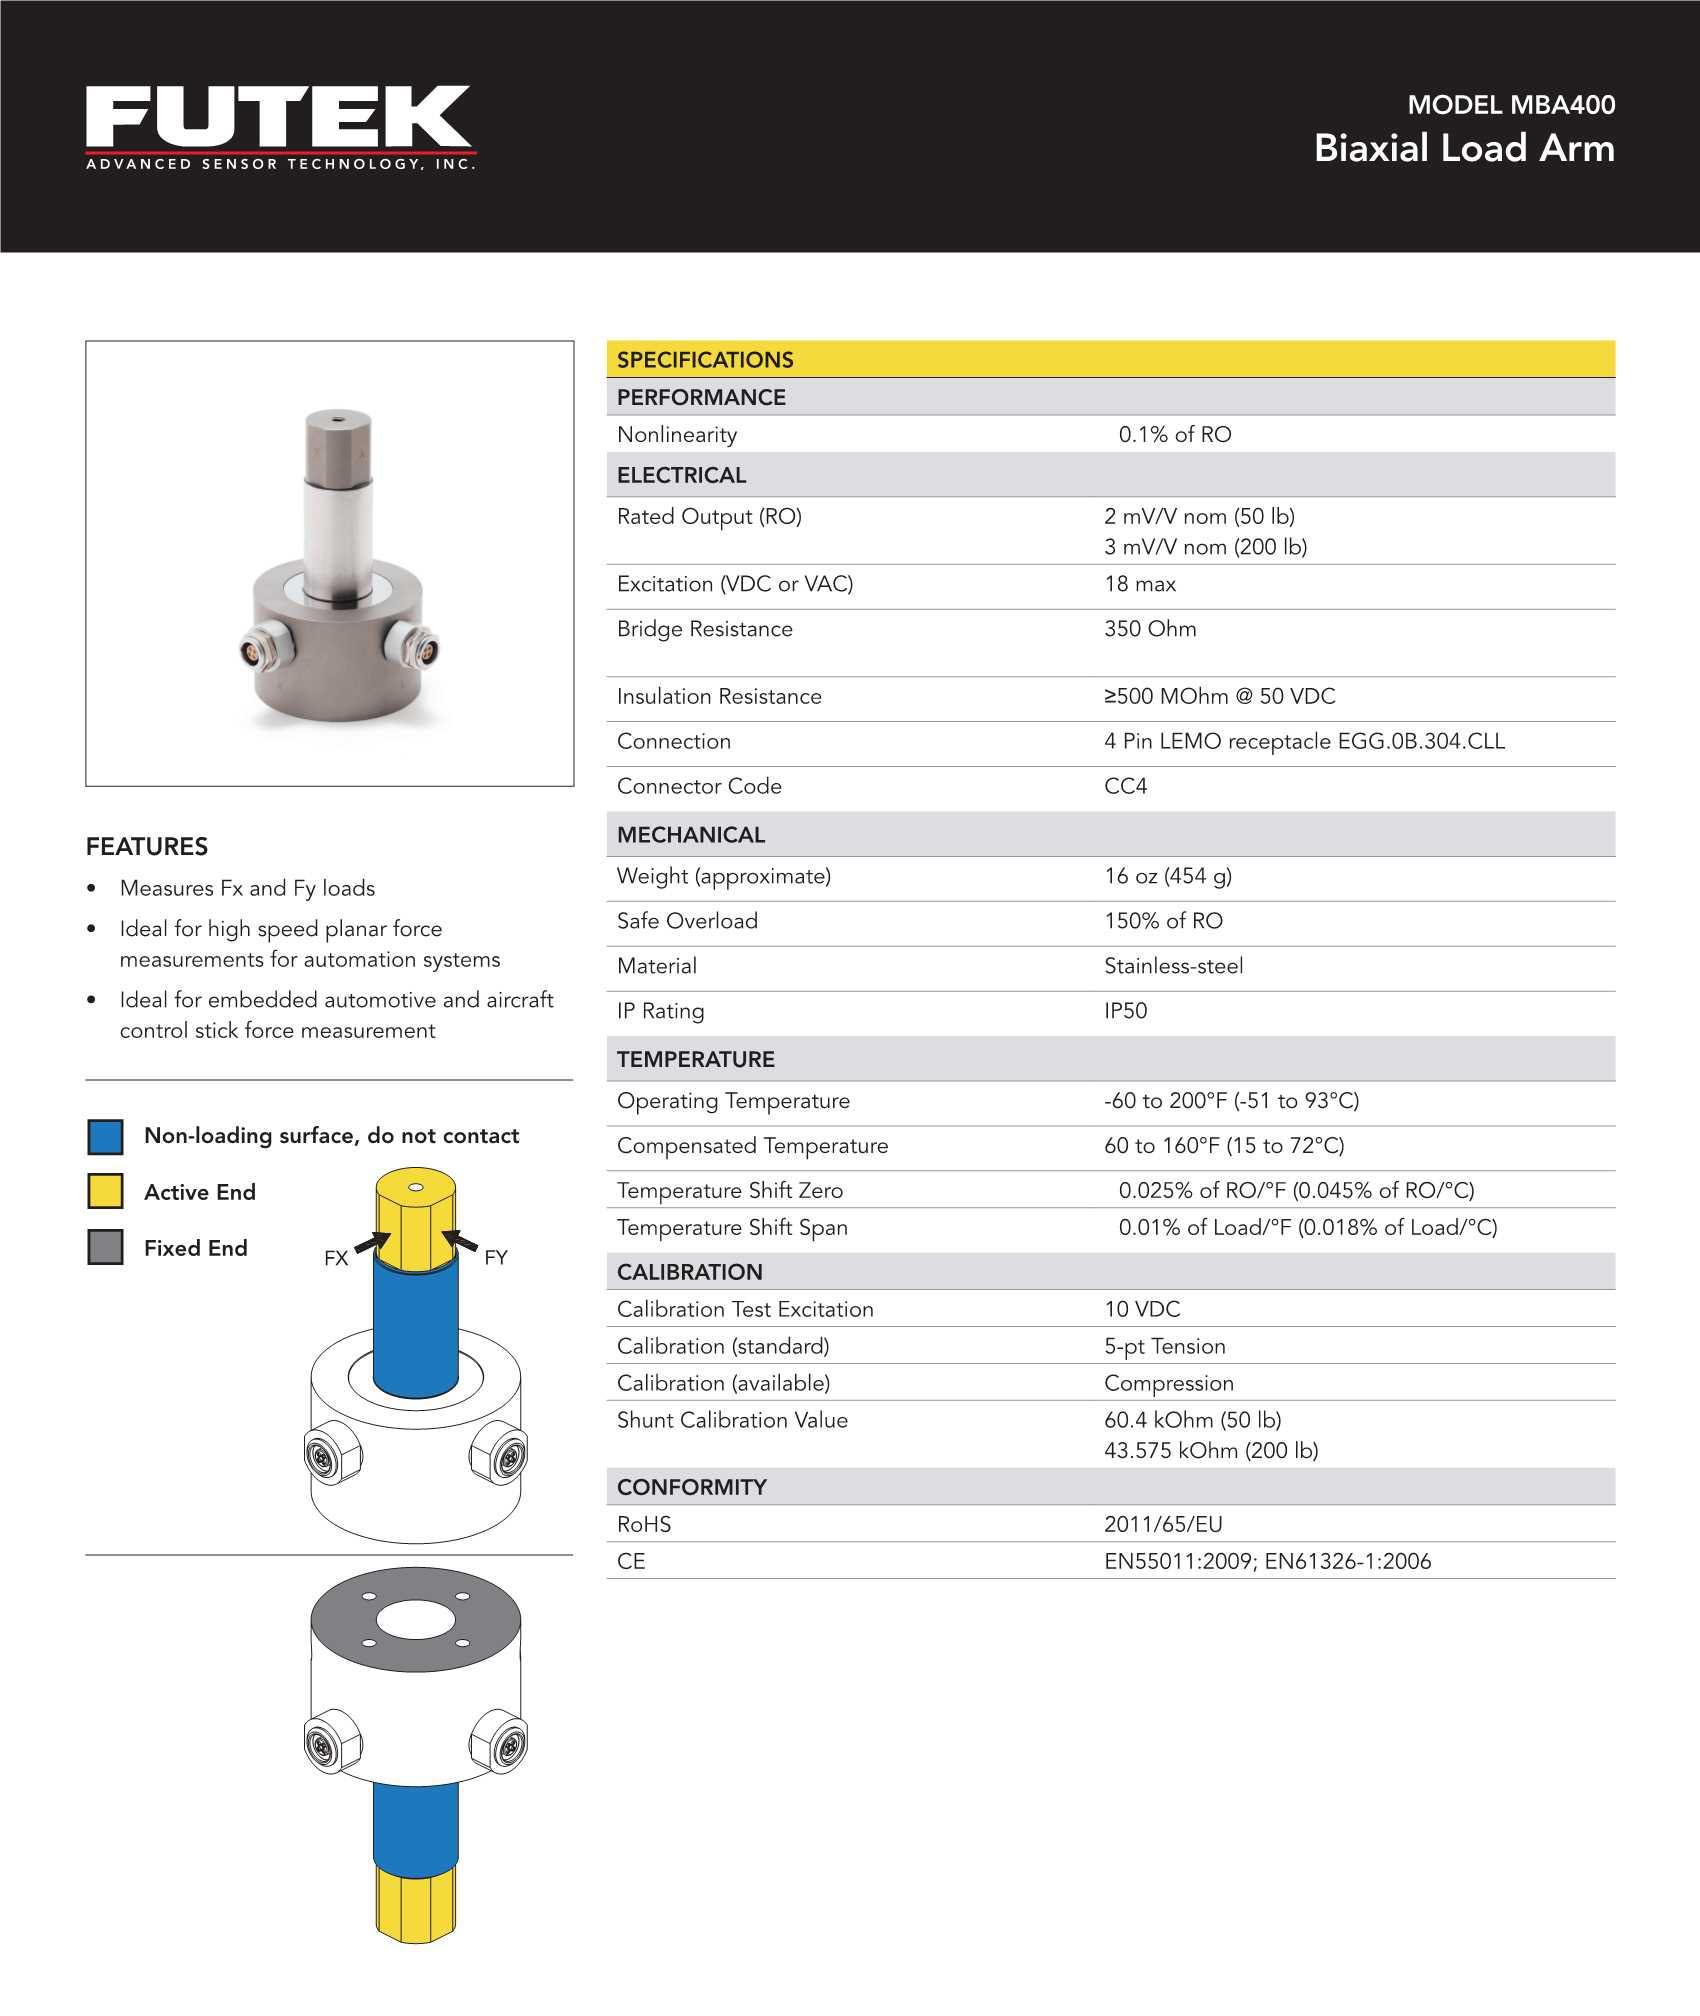 MBA400二轴力/二向力传感器 可同时测量Fx与Fy方向的力